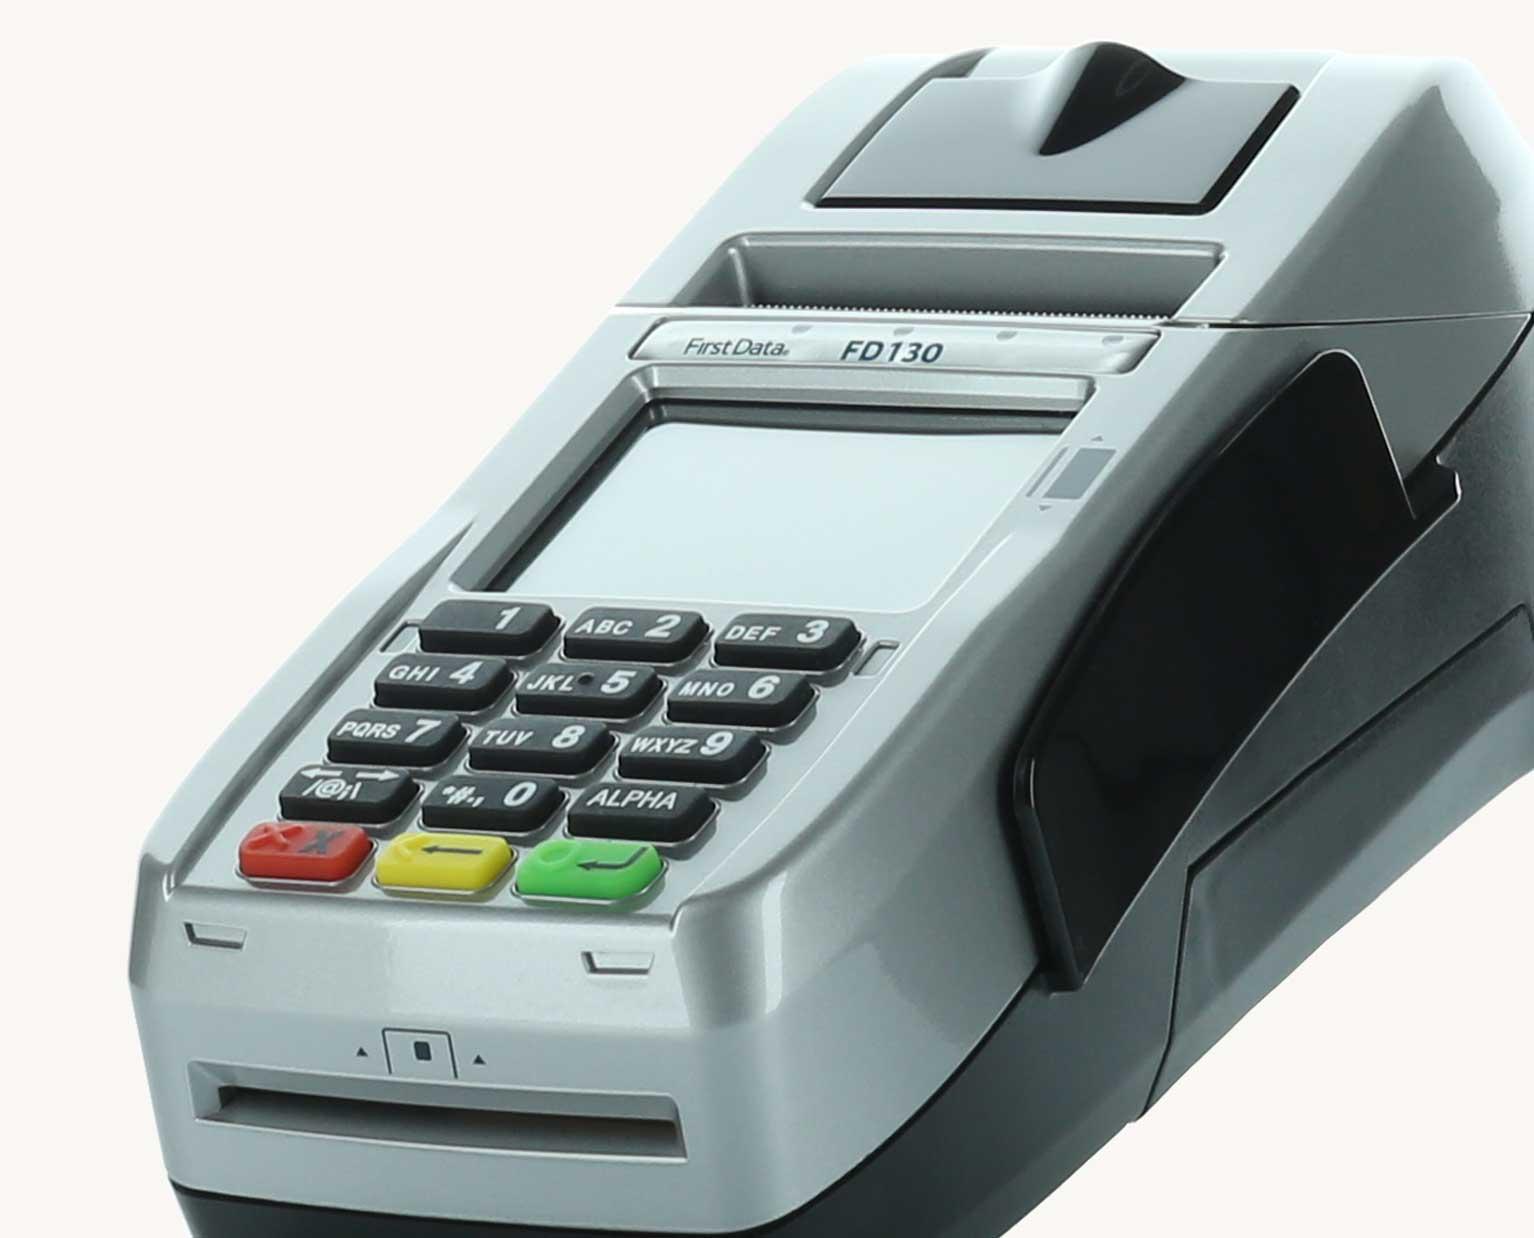 First Data FD130 EMV Credit Card Processing Terminal